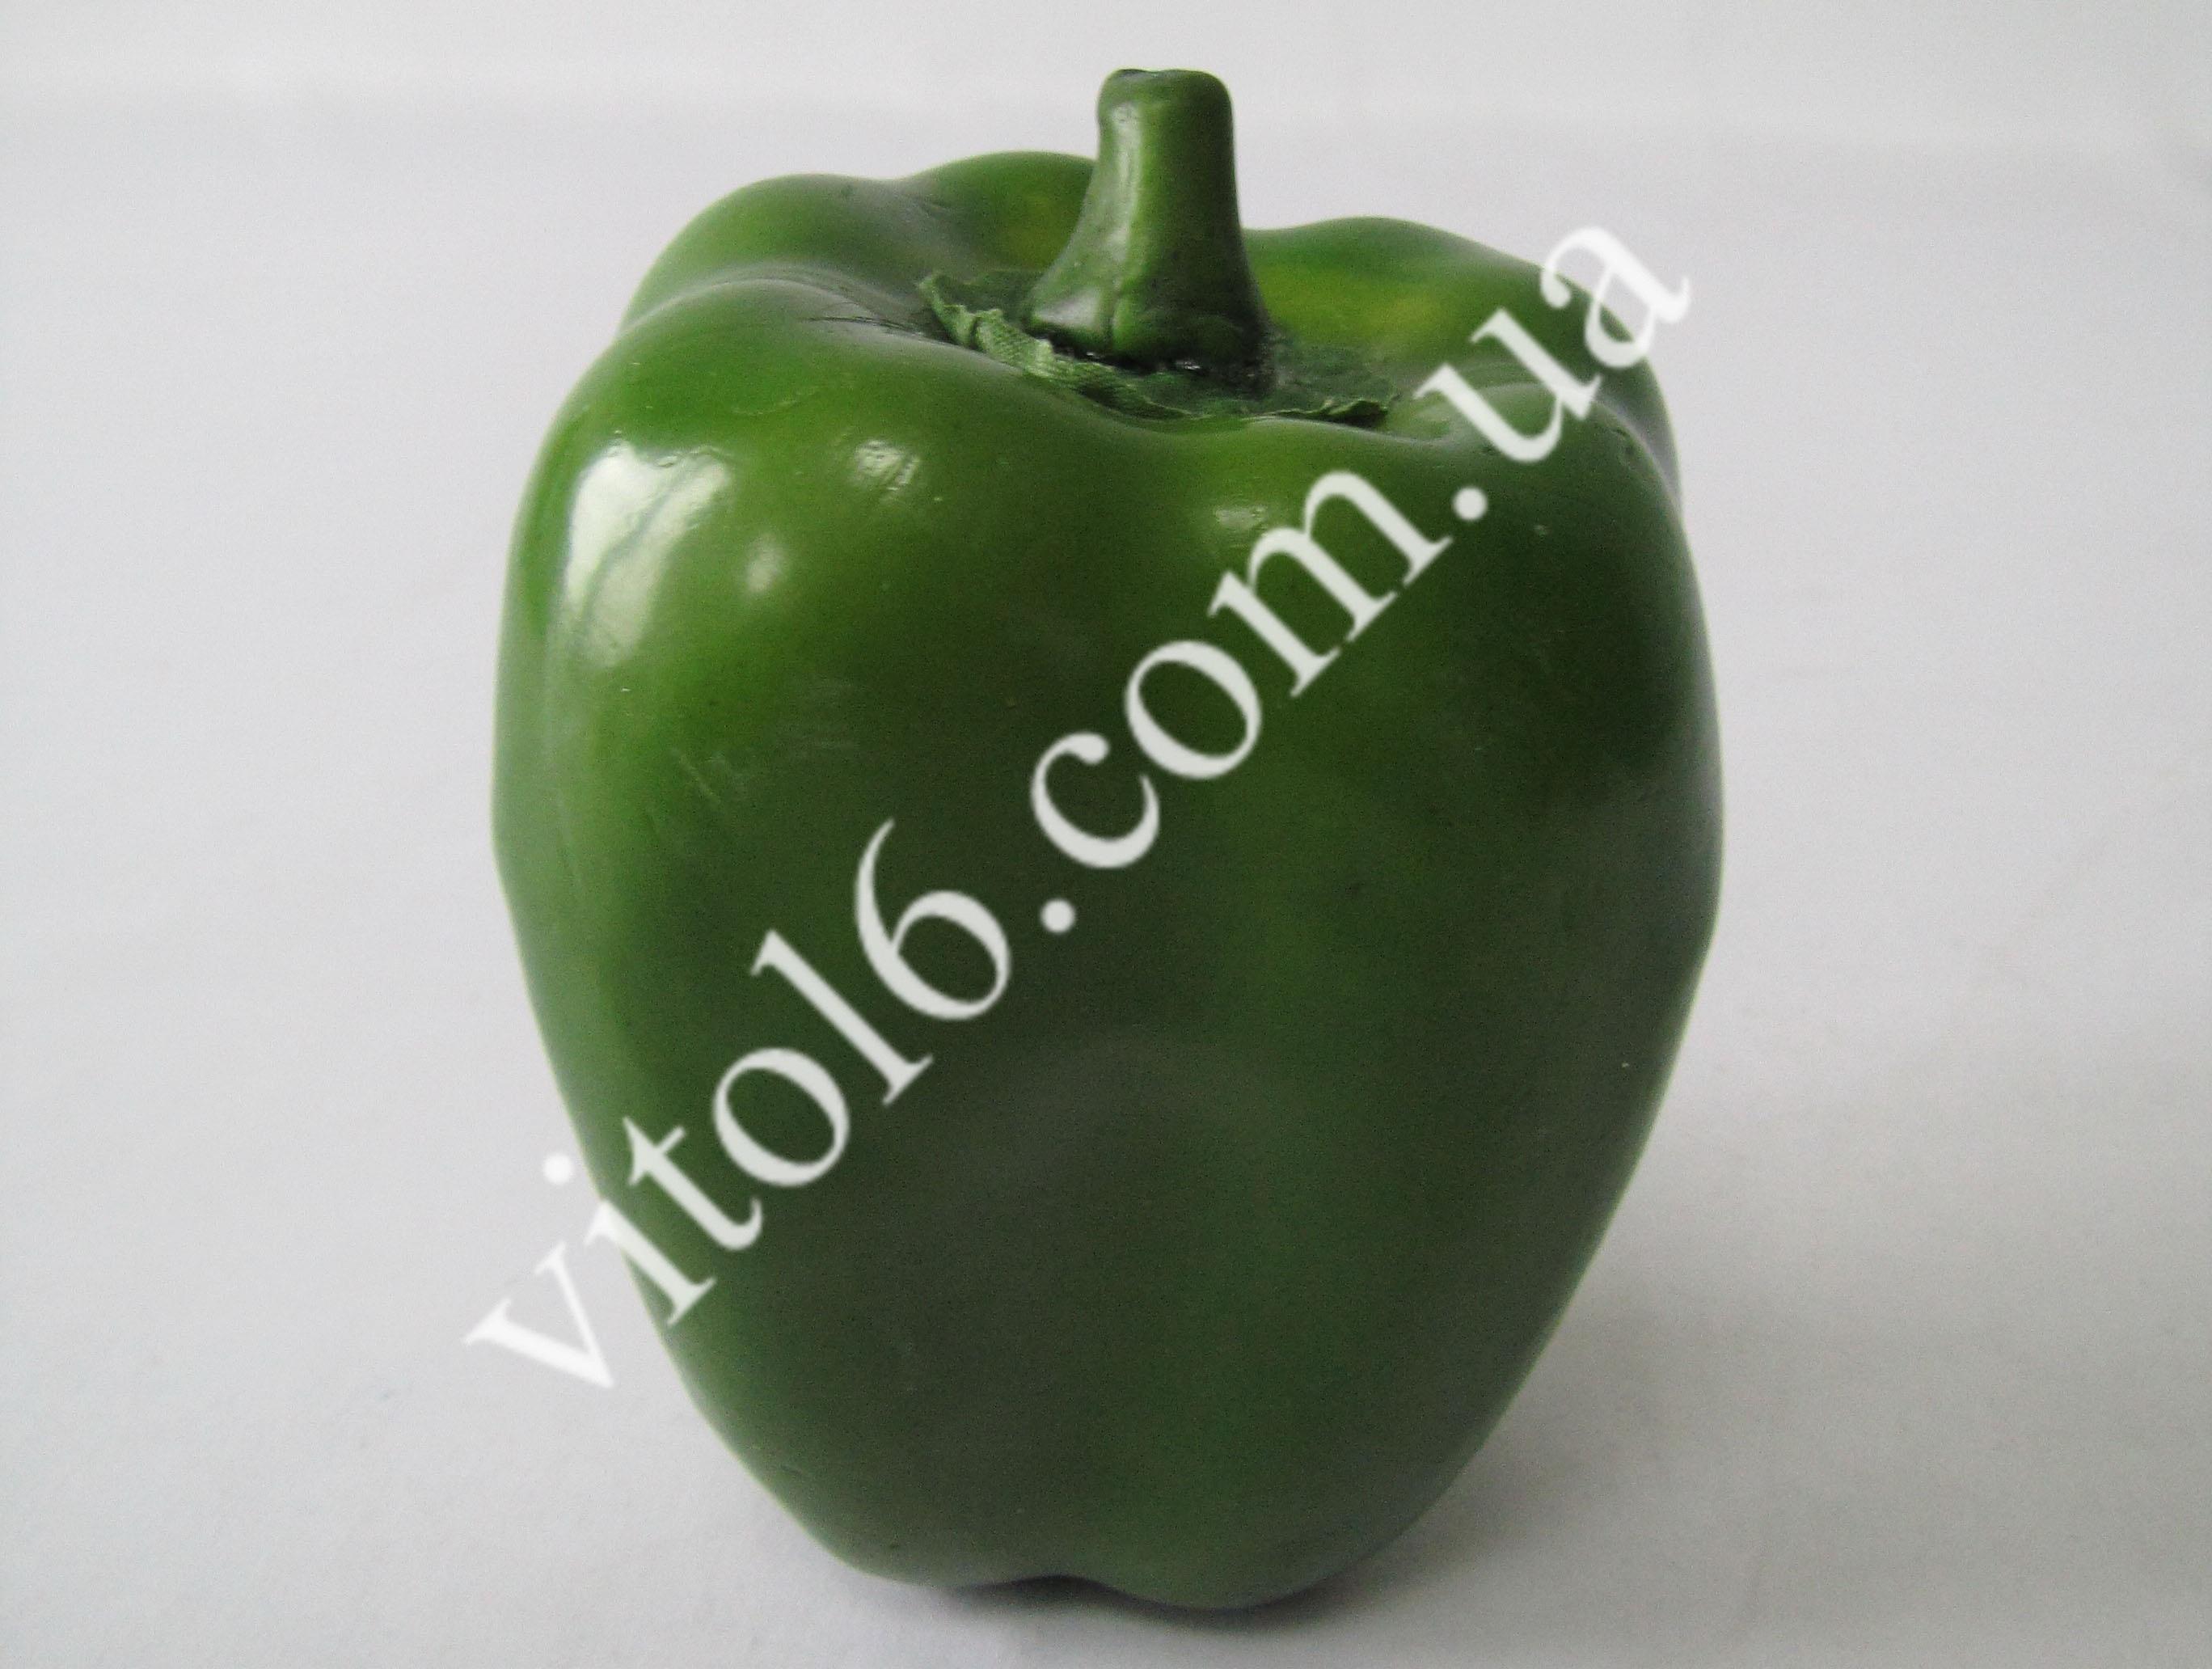 Сладкий перец зеленый VT6-12295 (180шт)